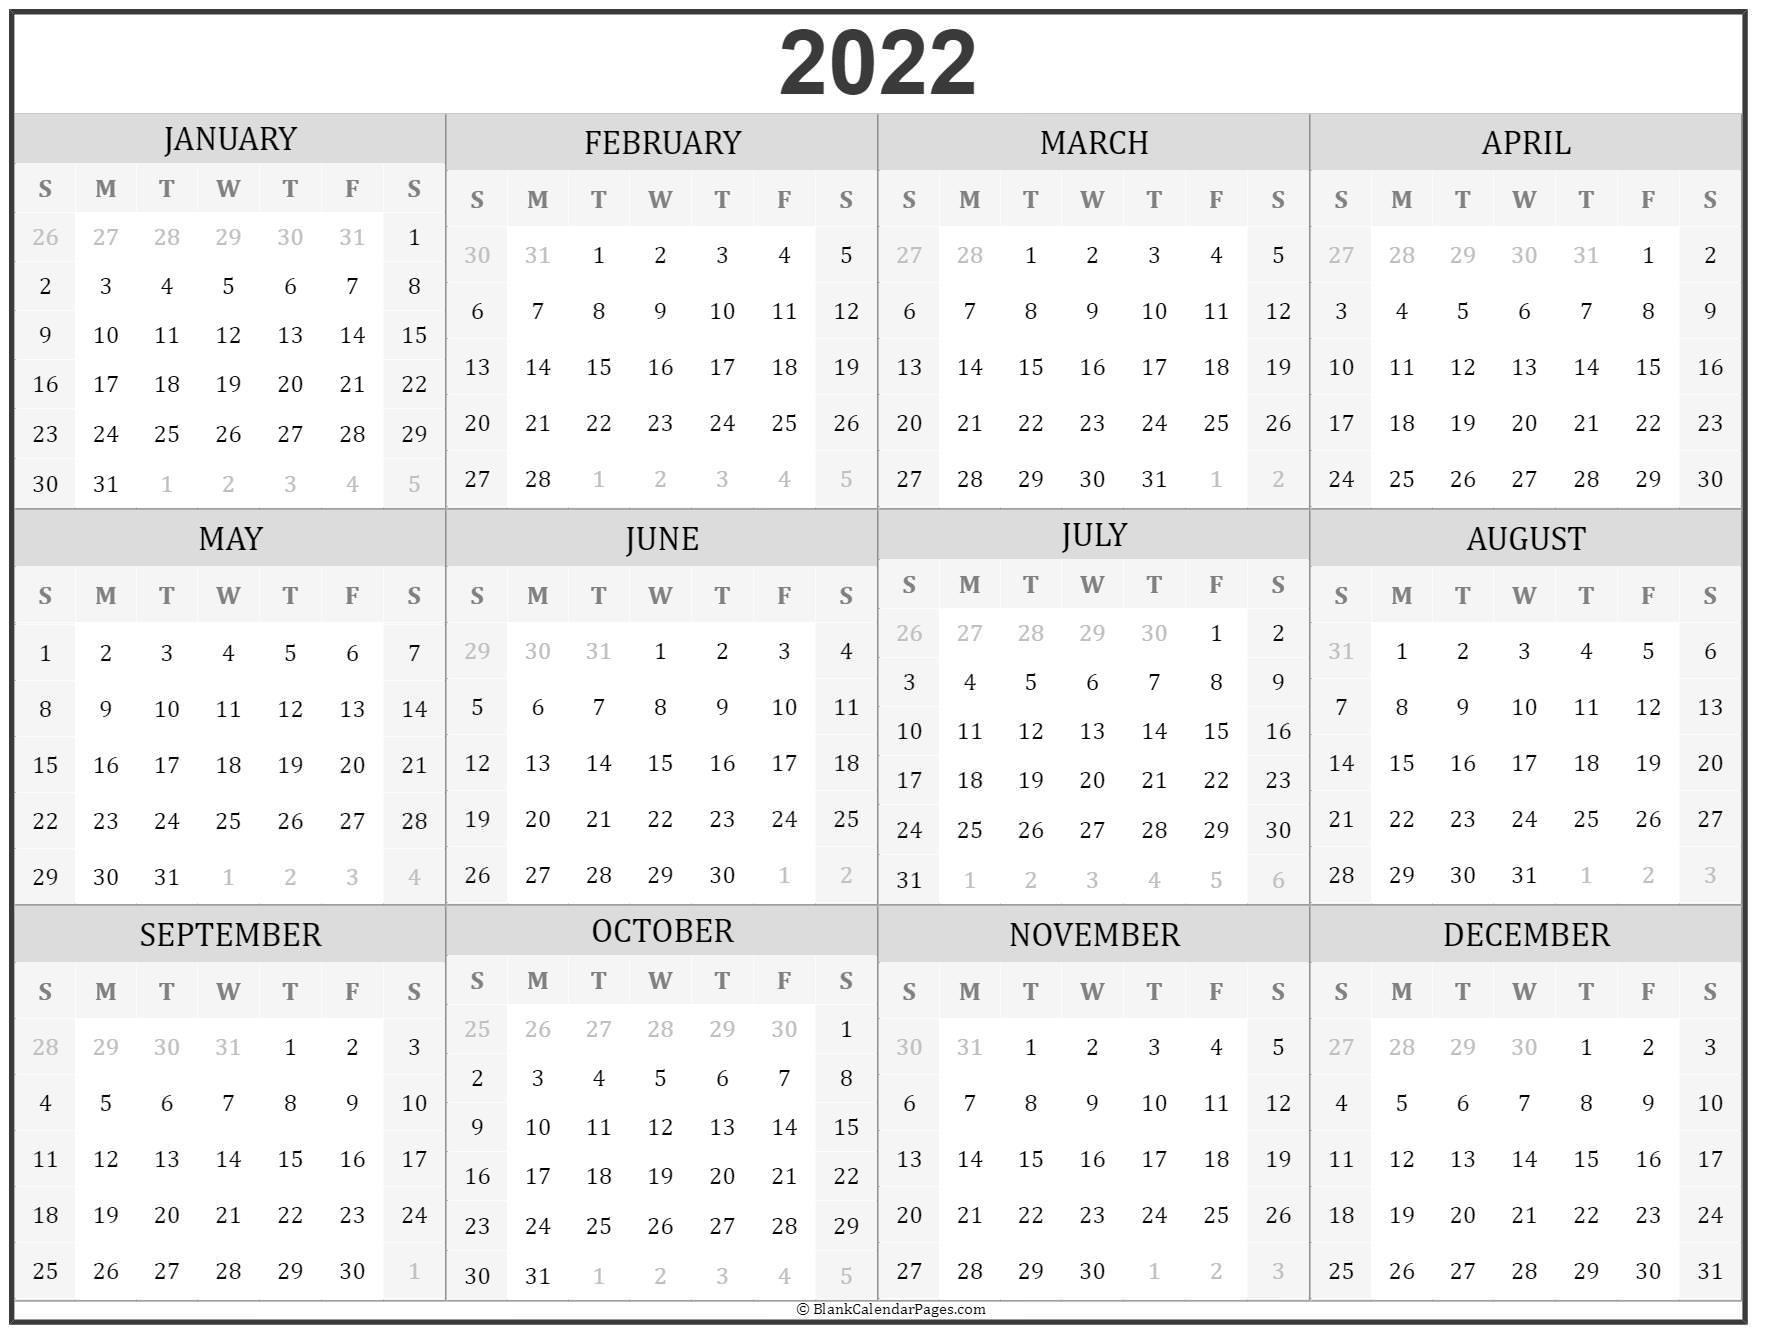 2022 Year Calendar Yearly Printable